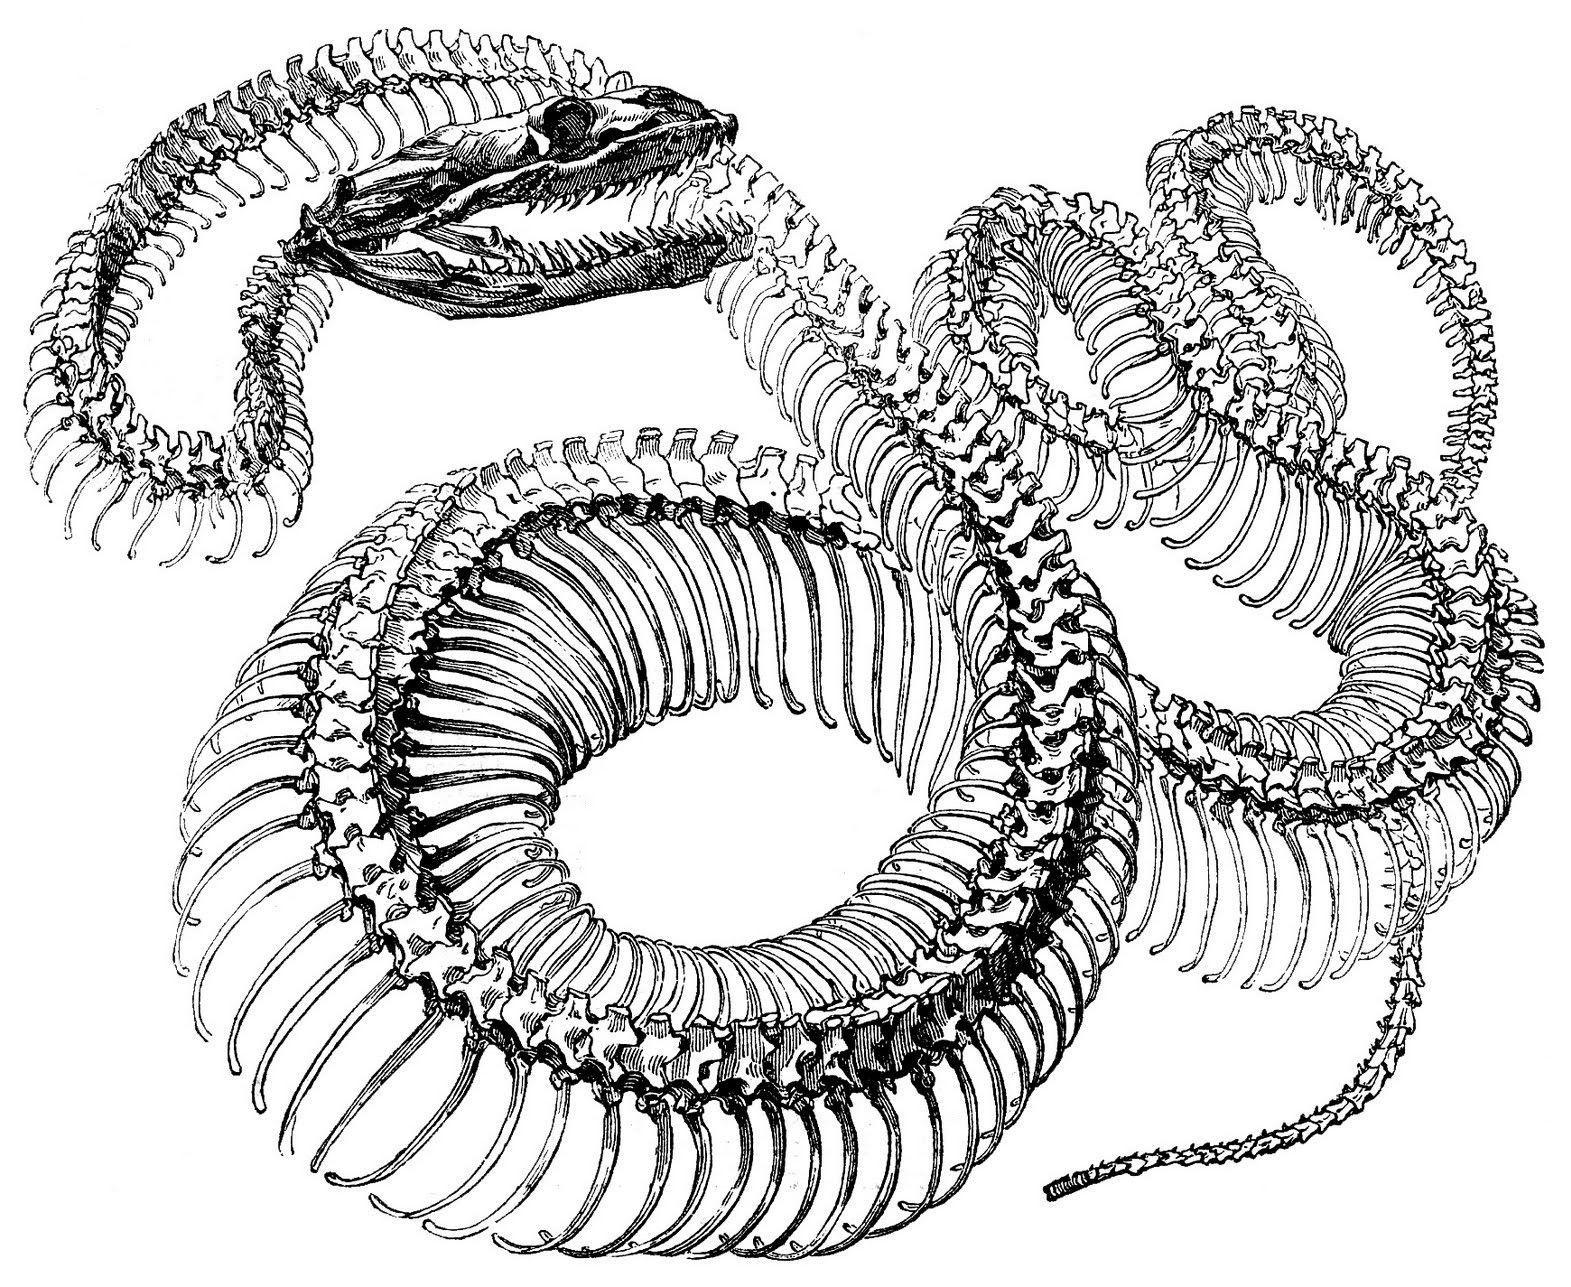 snake skeleton set of 4 waterproof temporary tattoos tatto rh pinterest com Snake Skeleton Tattoo Rabbit Skeleton Diagram